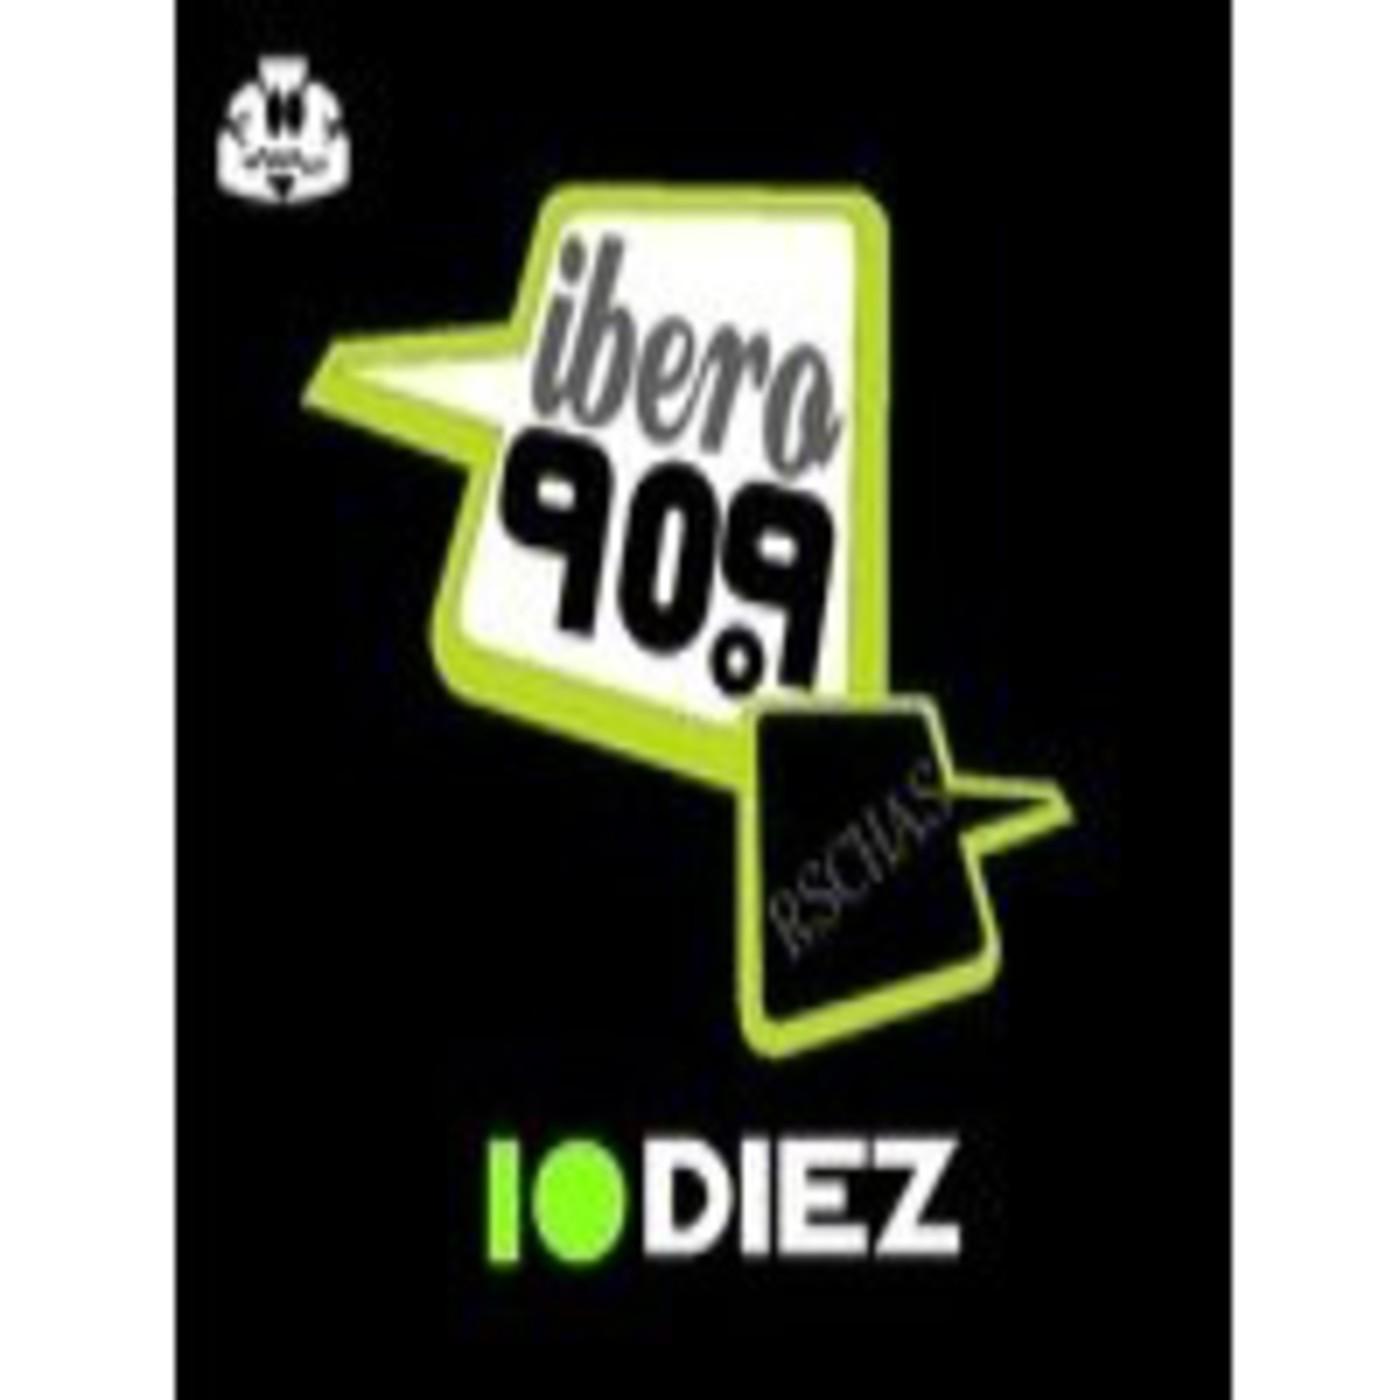 radio ibero 909 online dating